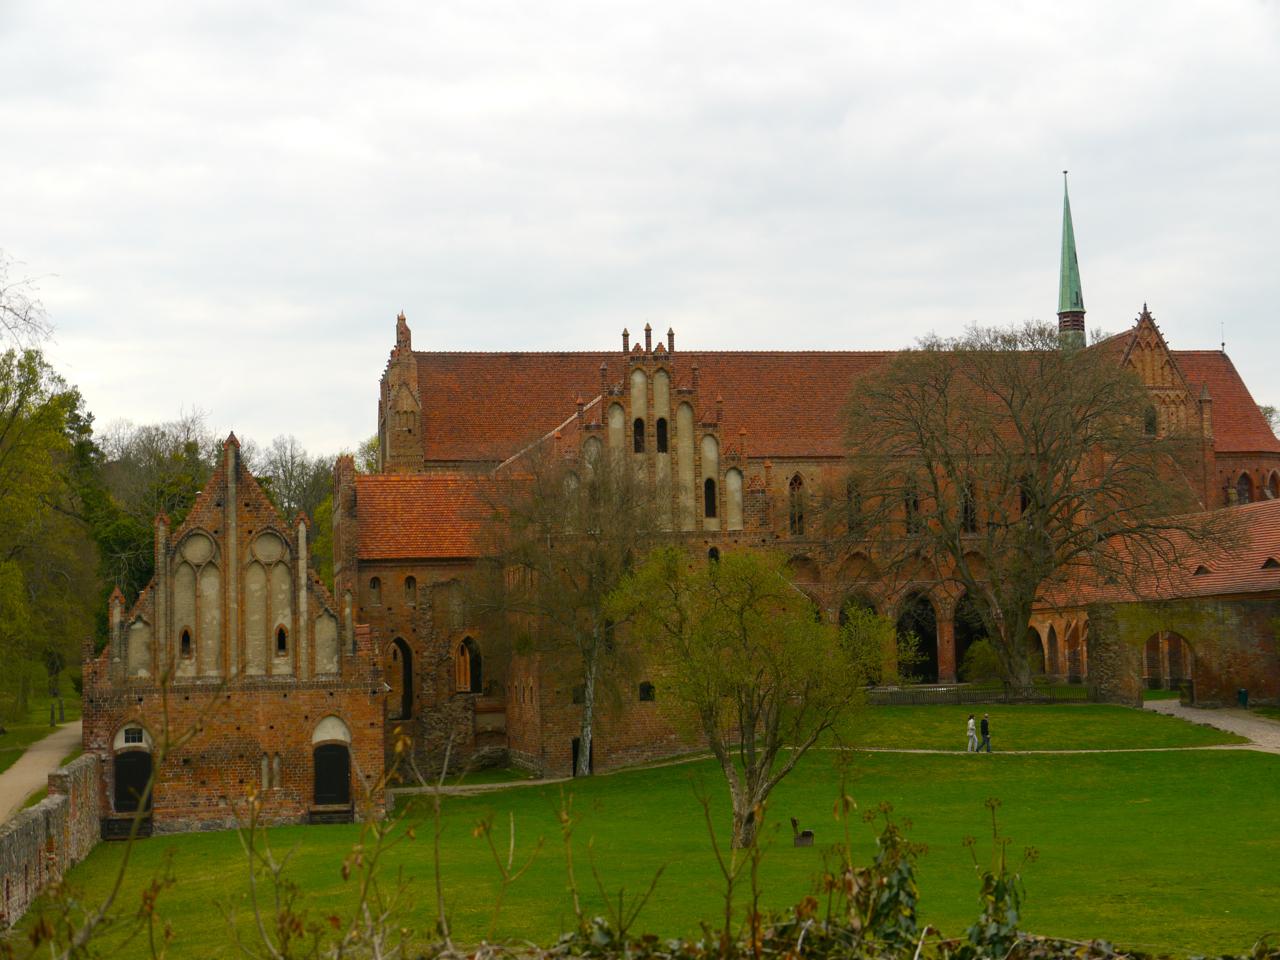 kloster-chorin-ausflugstipp-umland-berlin